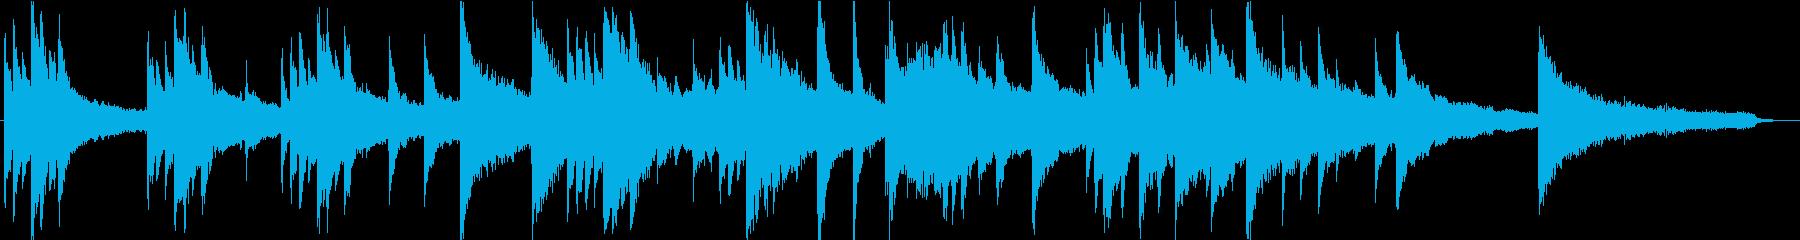 CM・企業VP用、60秒尺のピアノ楽曲の再生済みの波形